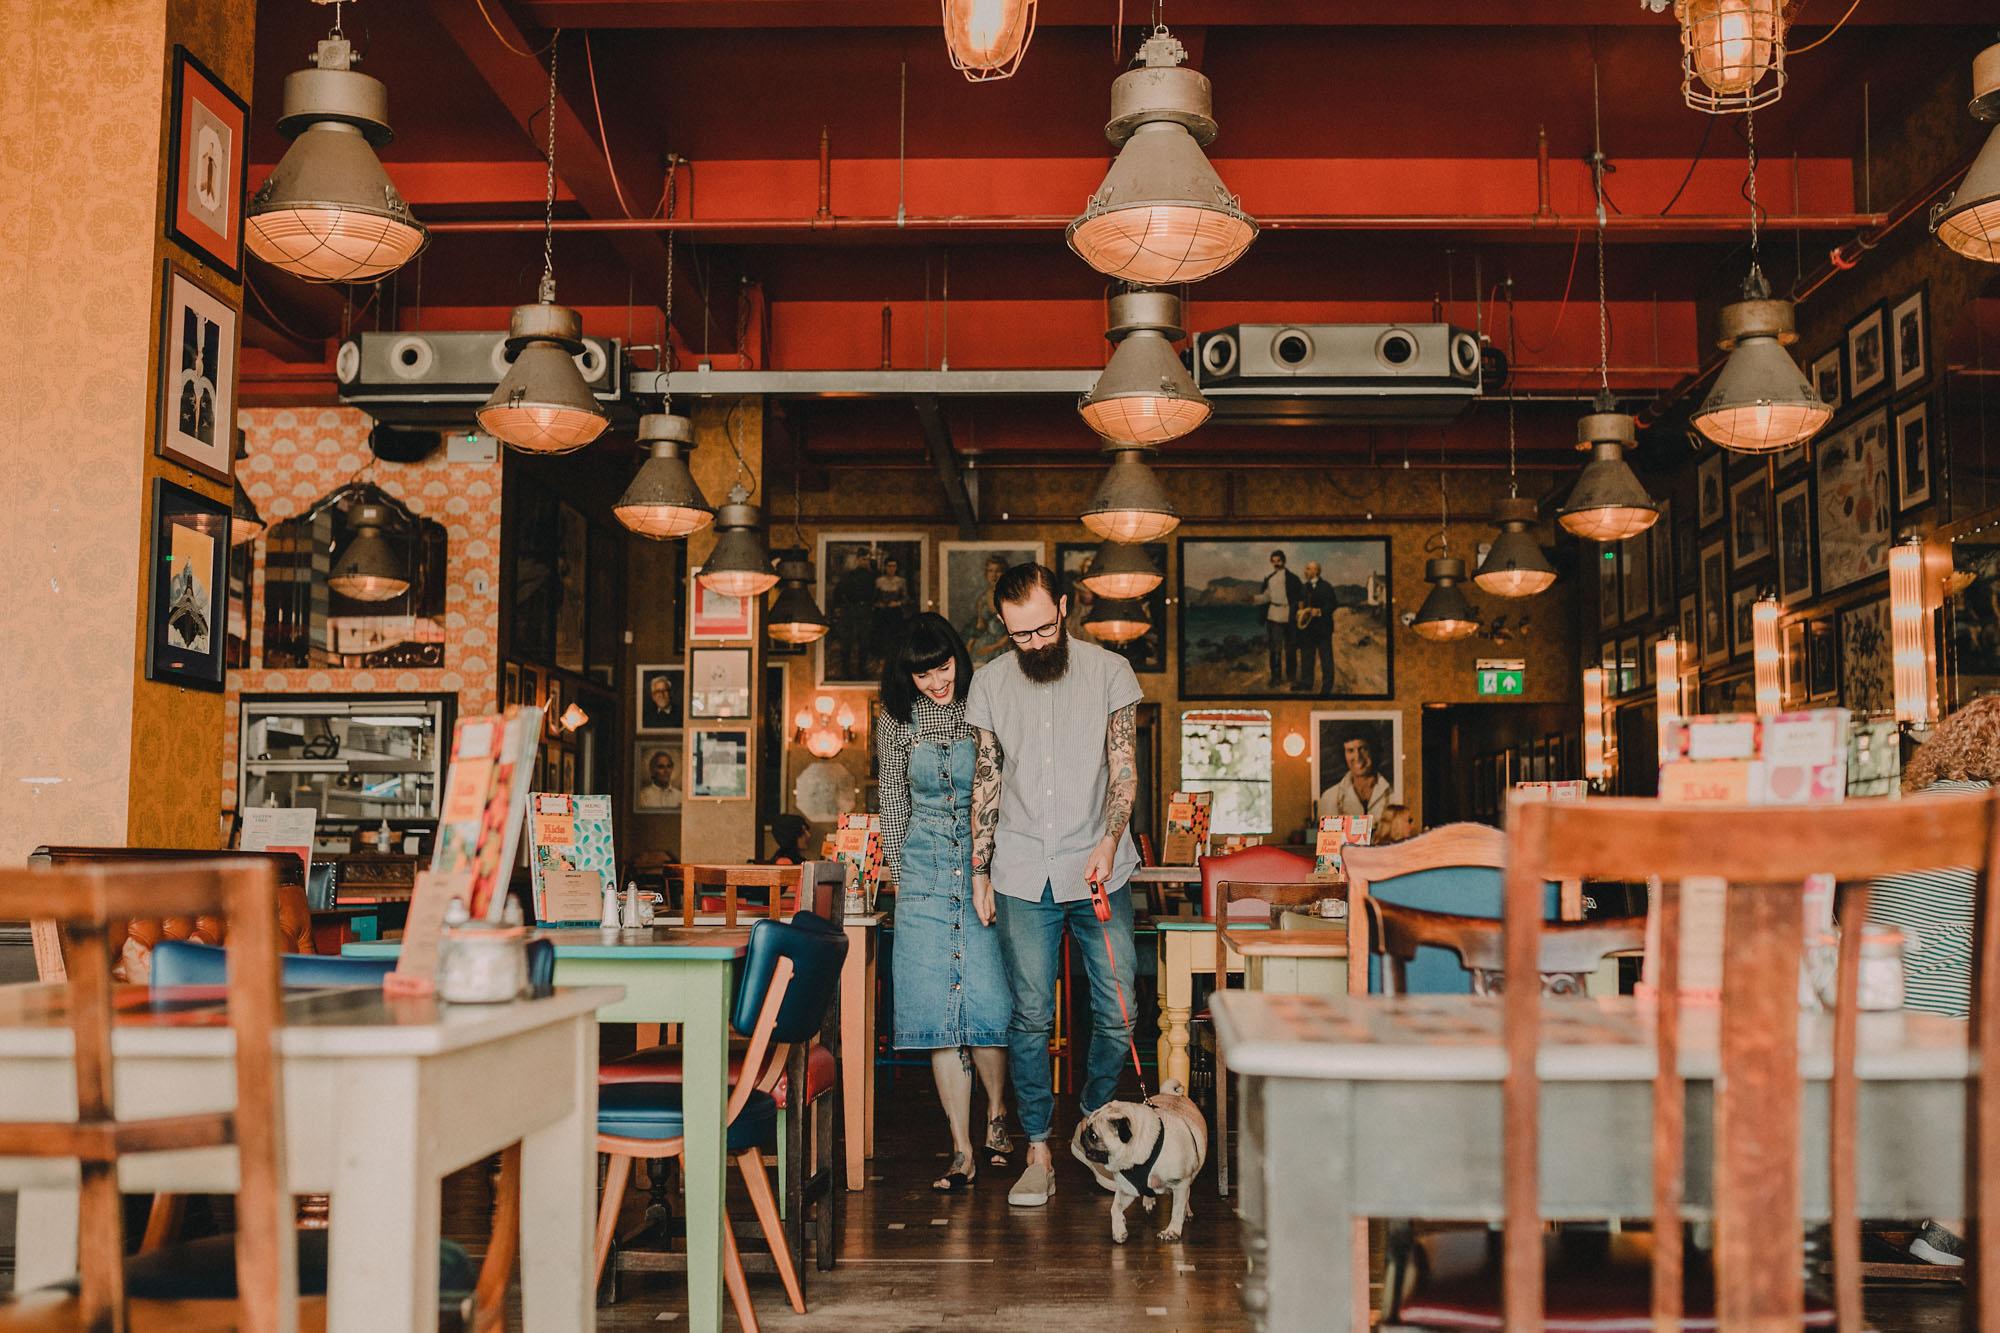 Cafe-Bar-Engagement-Photography29.jpg